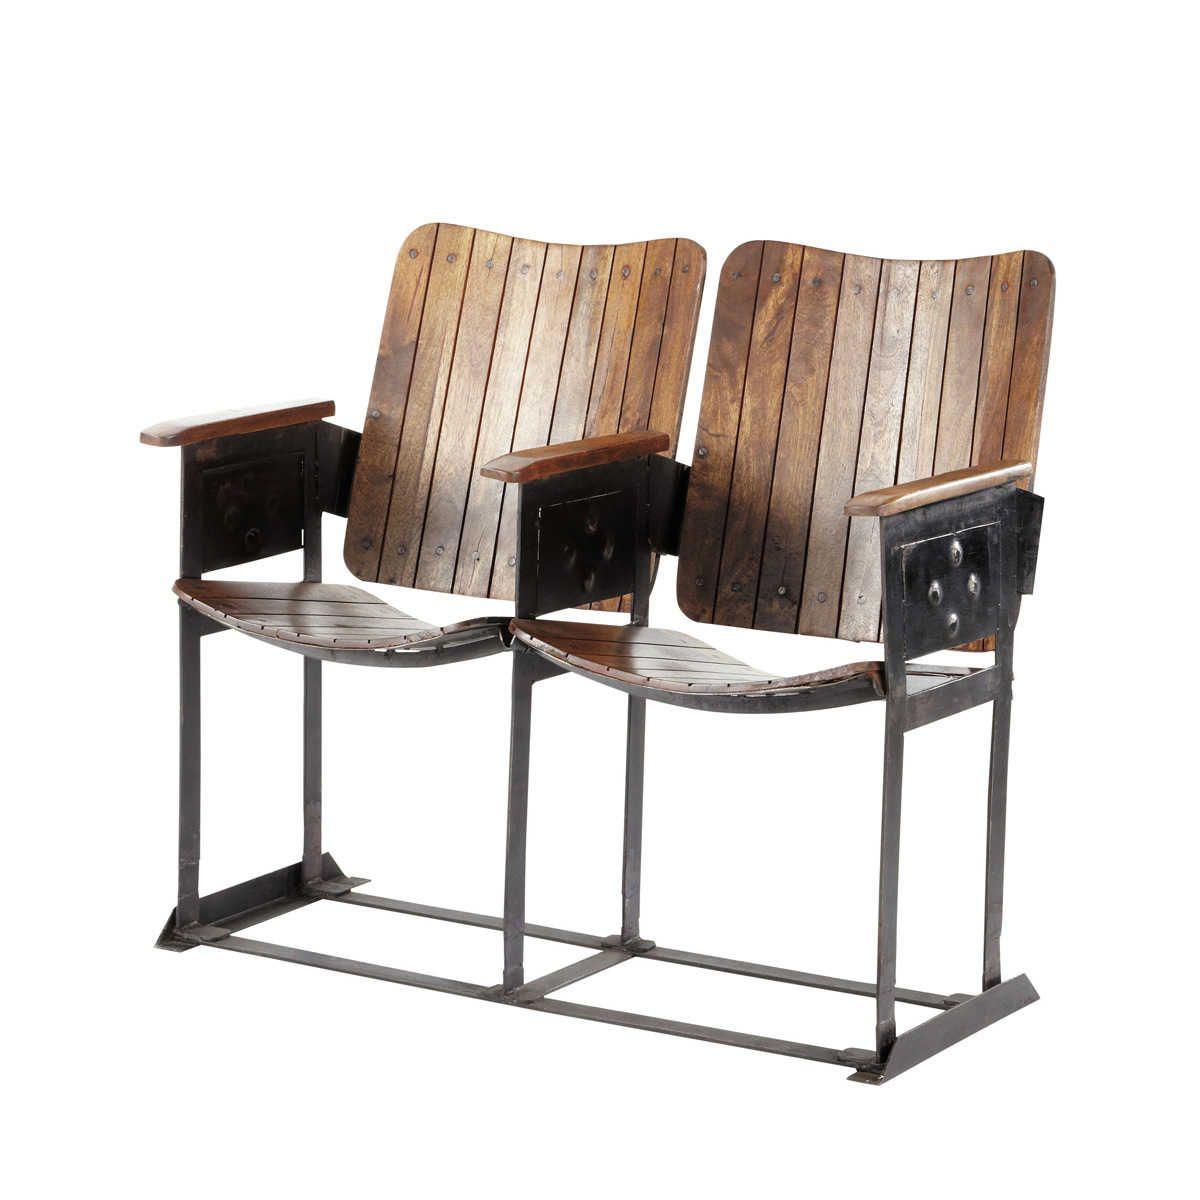 2-Sitzer Bank im Industrial-Stil aus Mangoholz antik | Industrial ...